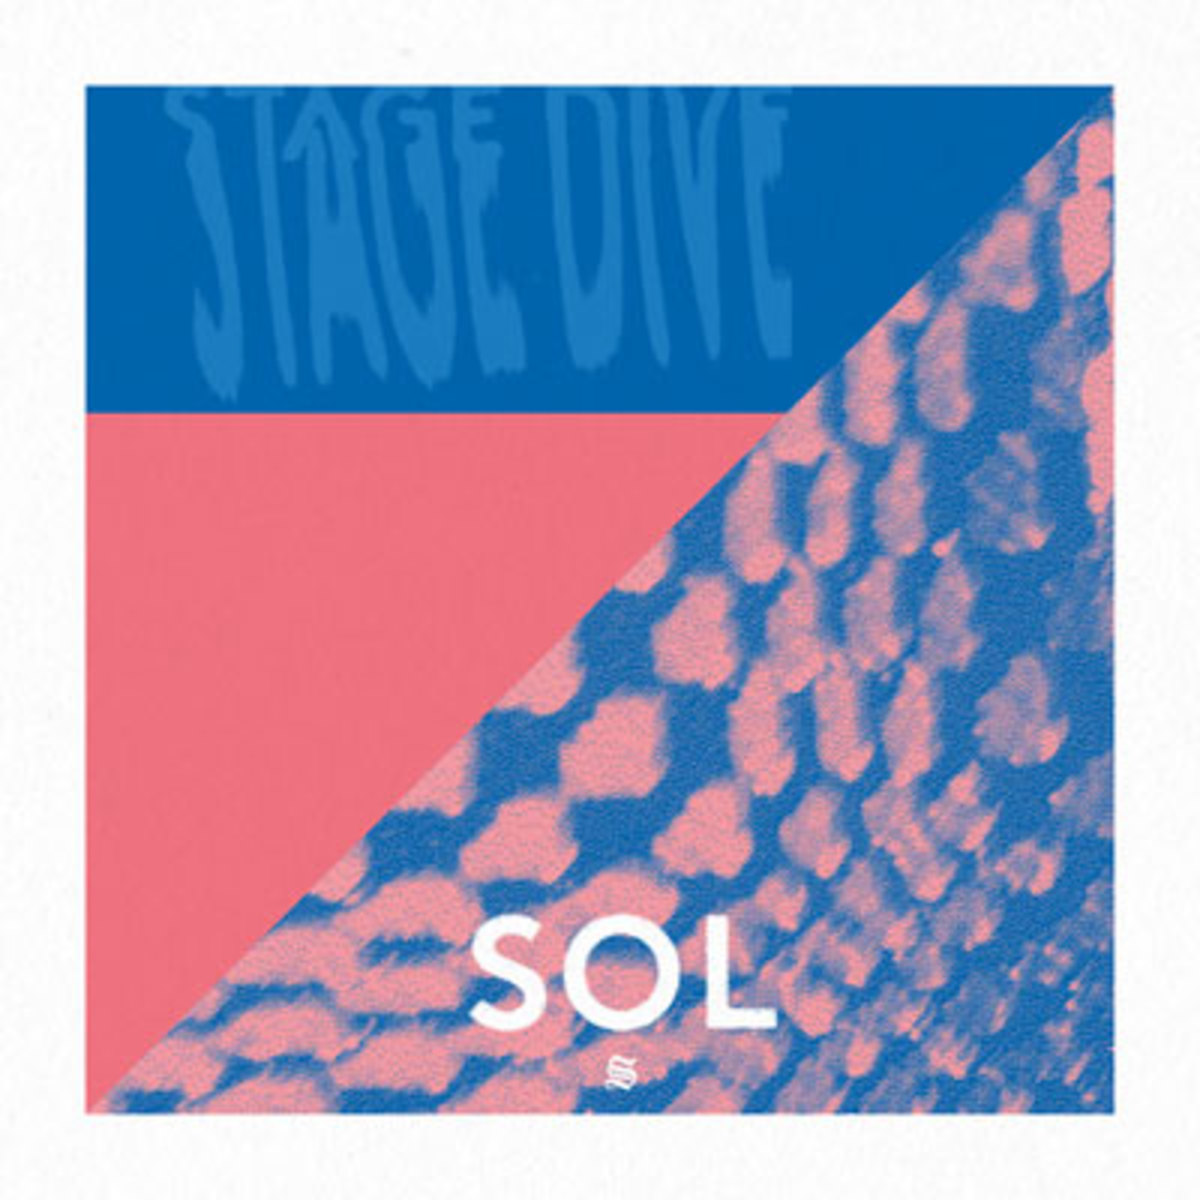 sol-stagedive.jpg